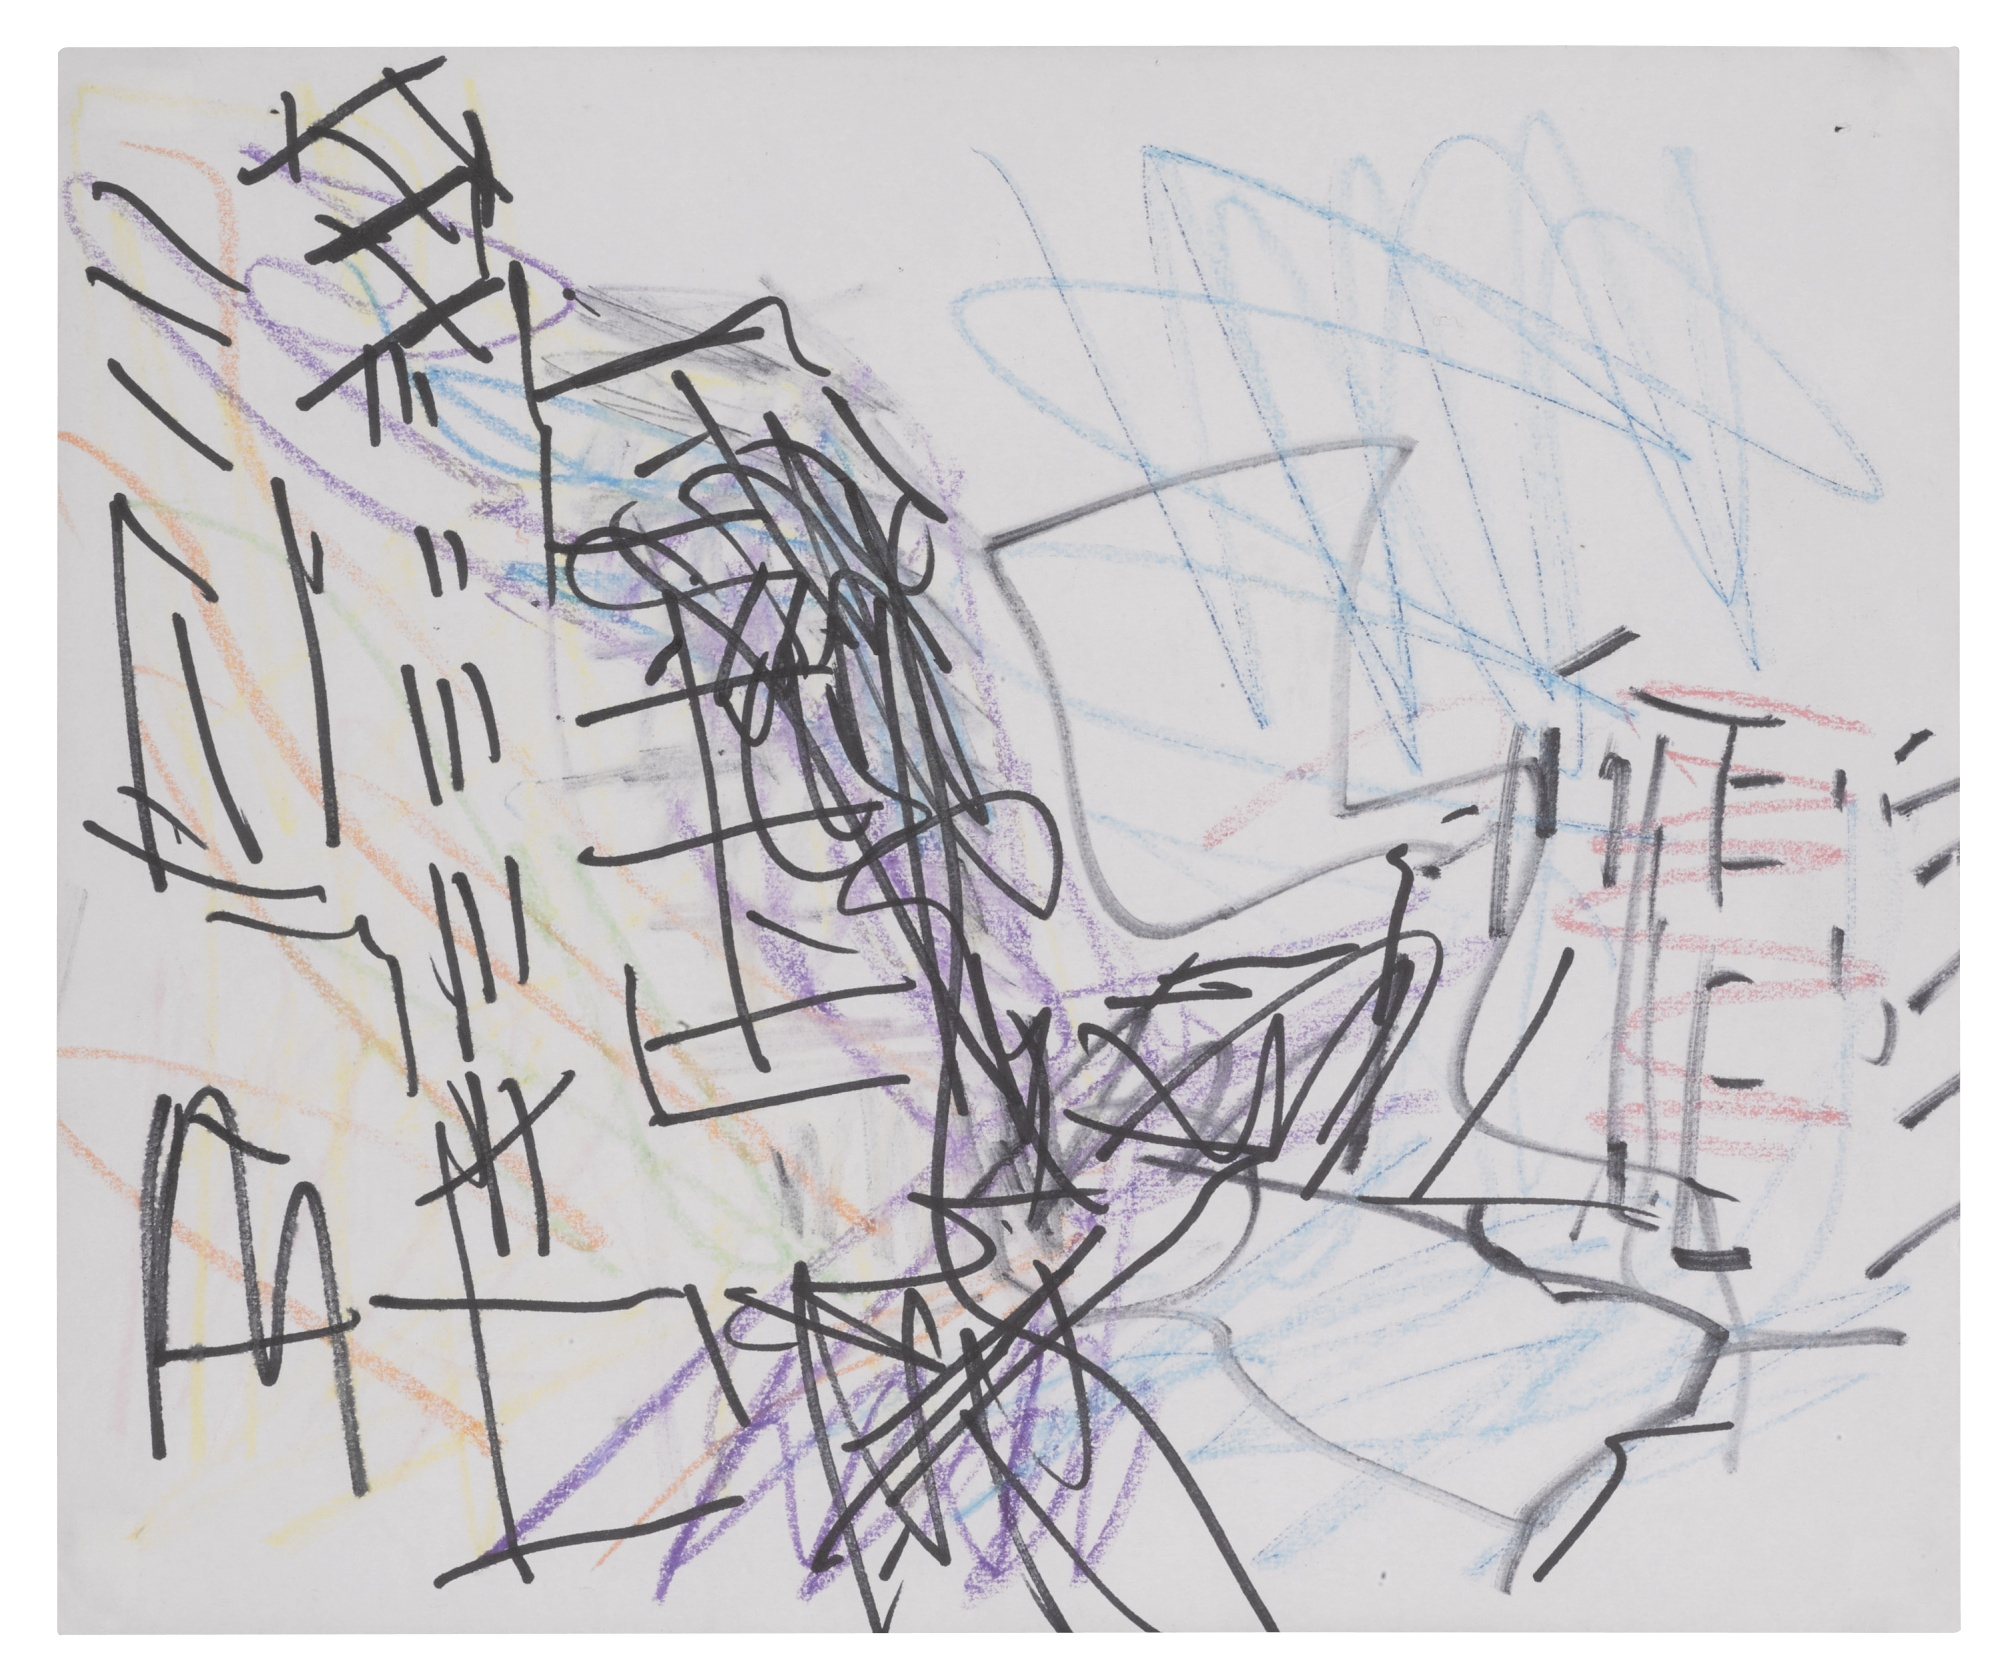 Frank Auerbach-Study For Mornington Crescent-1988